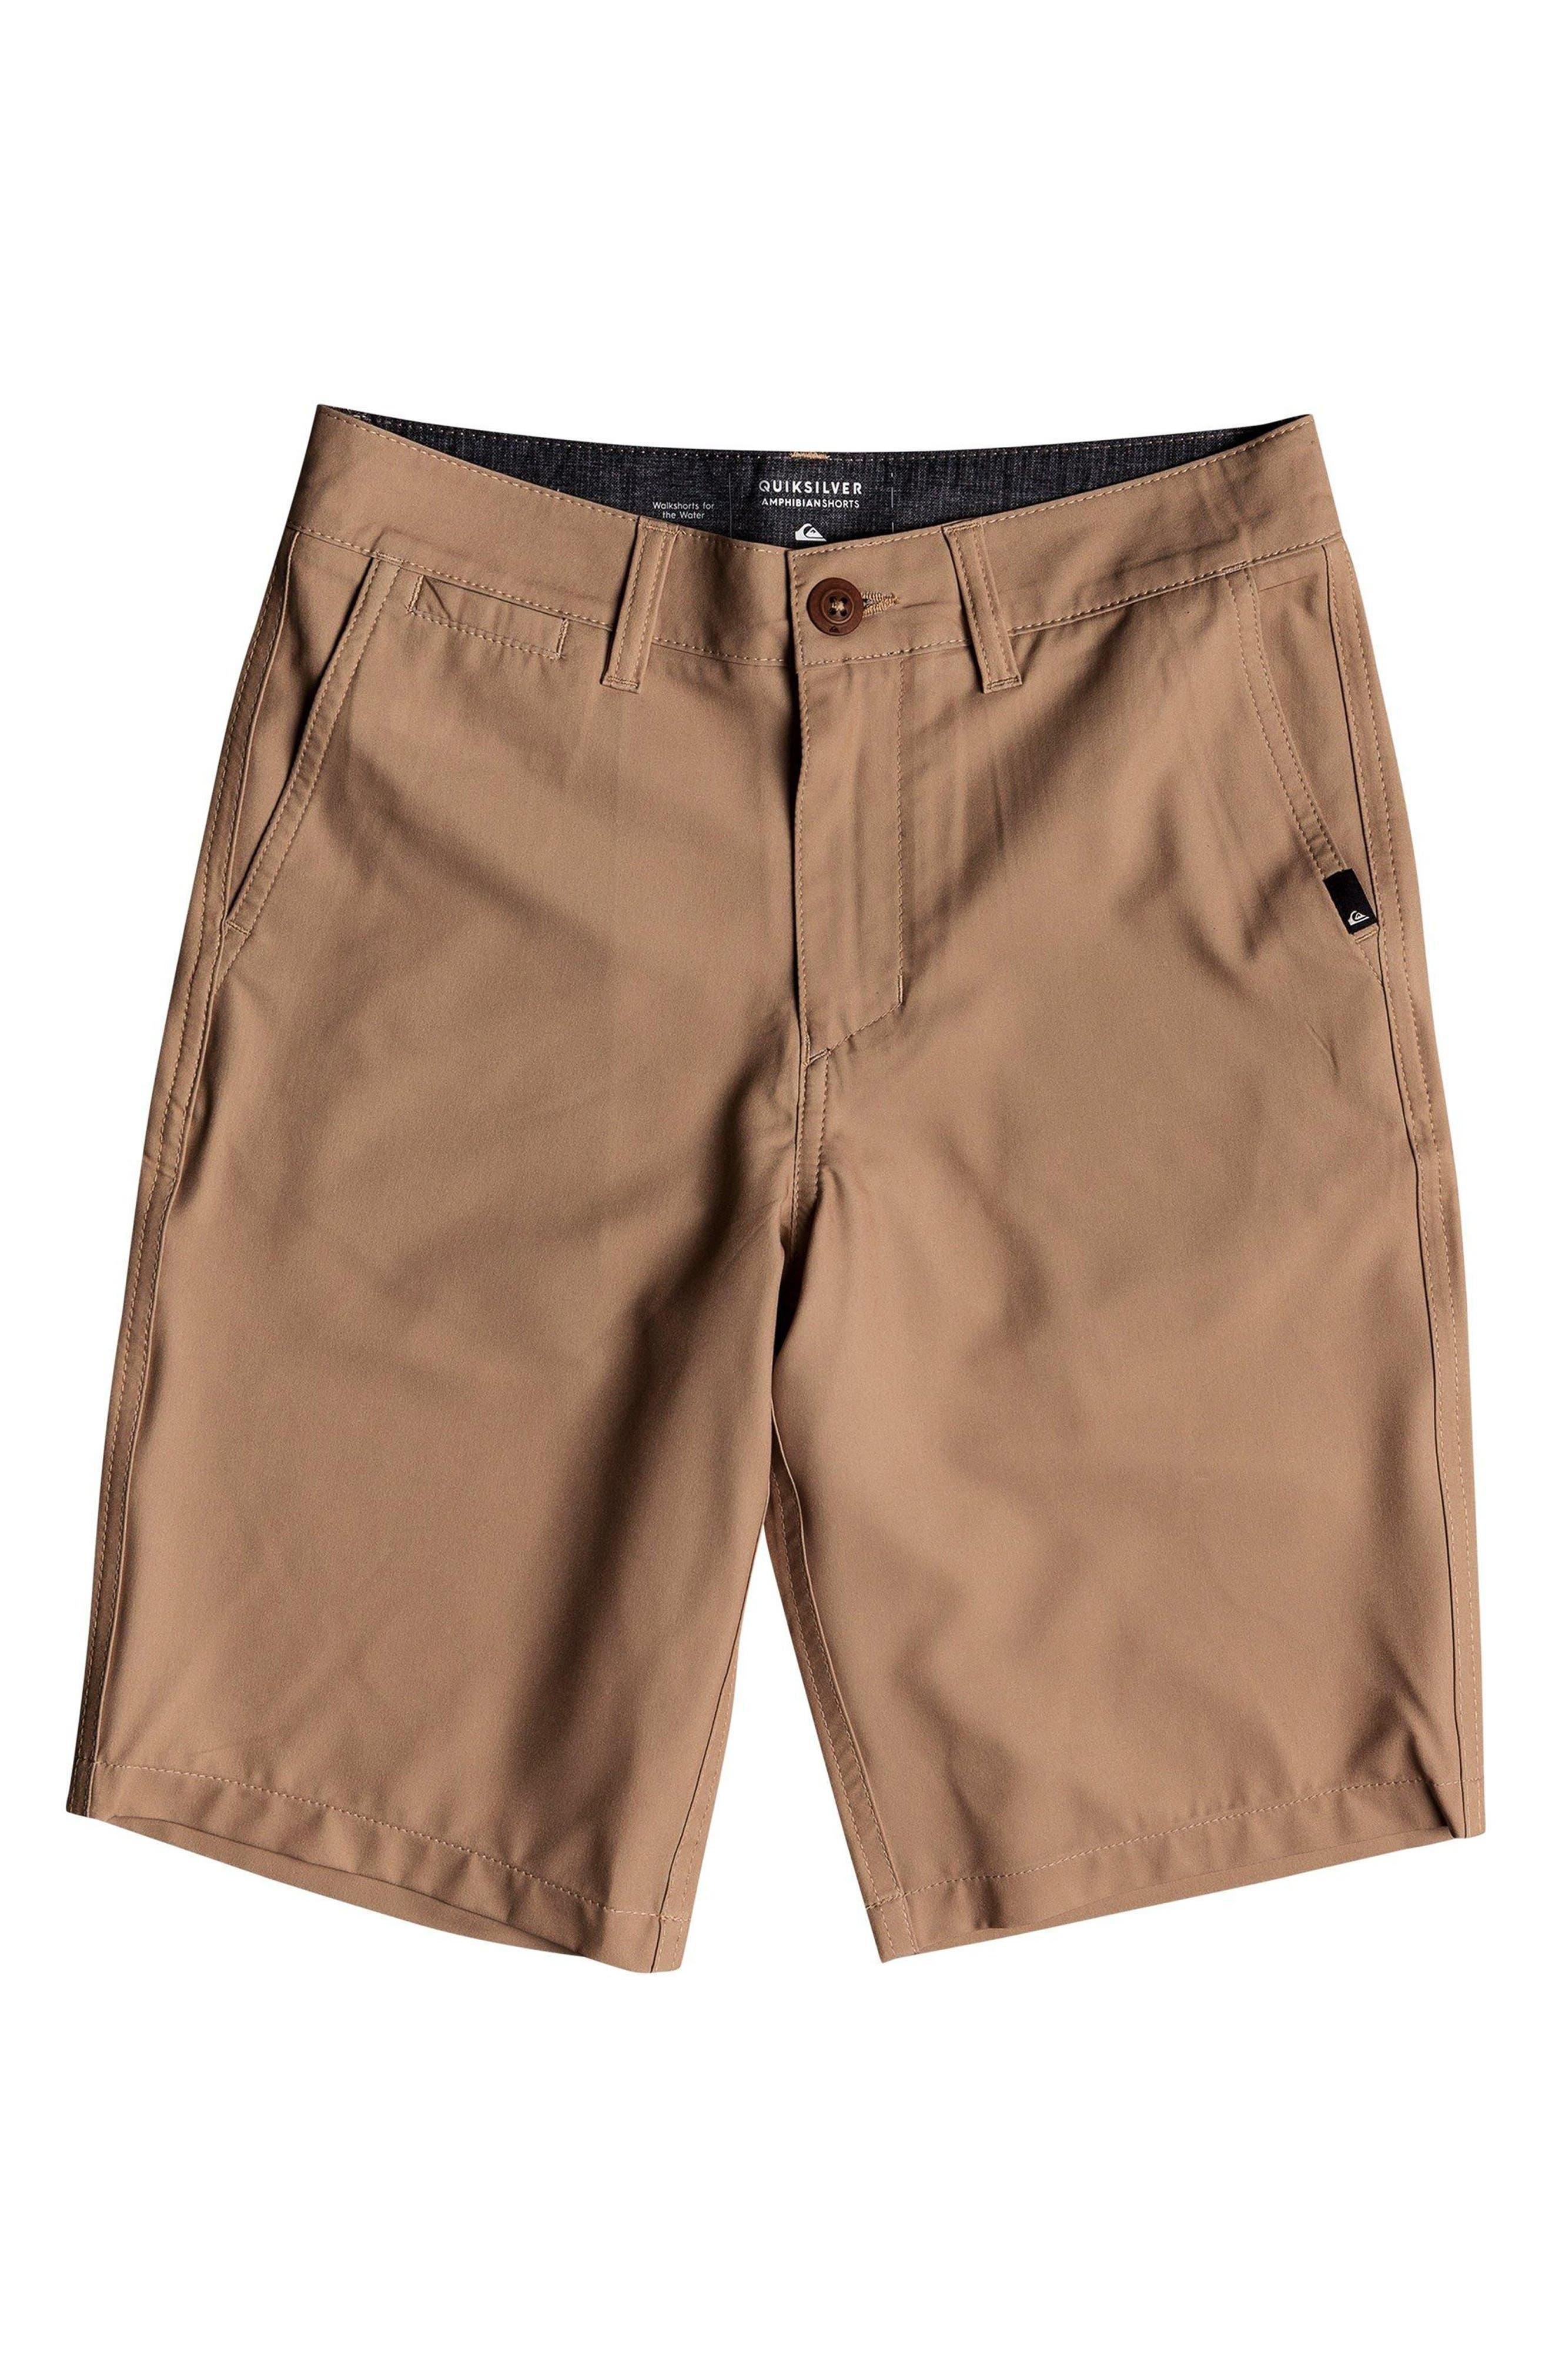 Boys Quiksilver Union Amphibian Hybrid Shorts Size 30  Brown